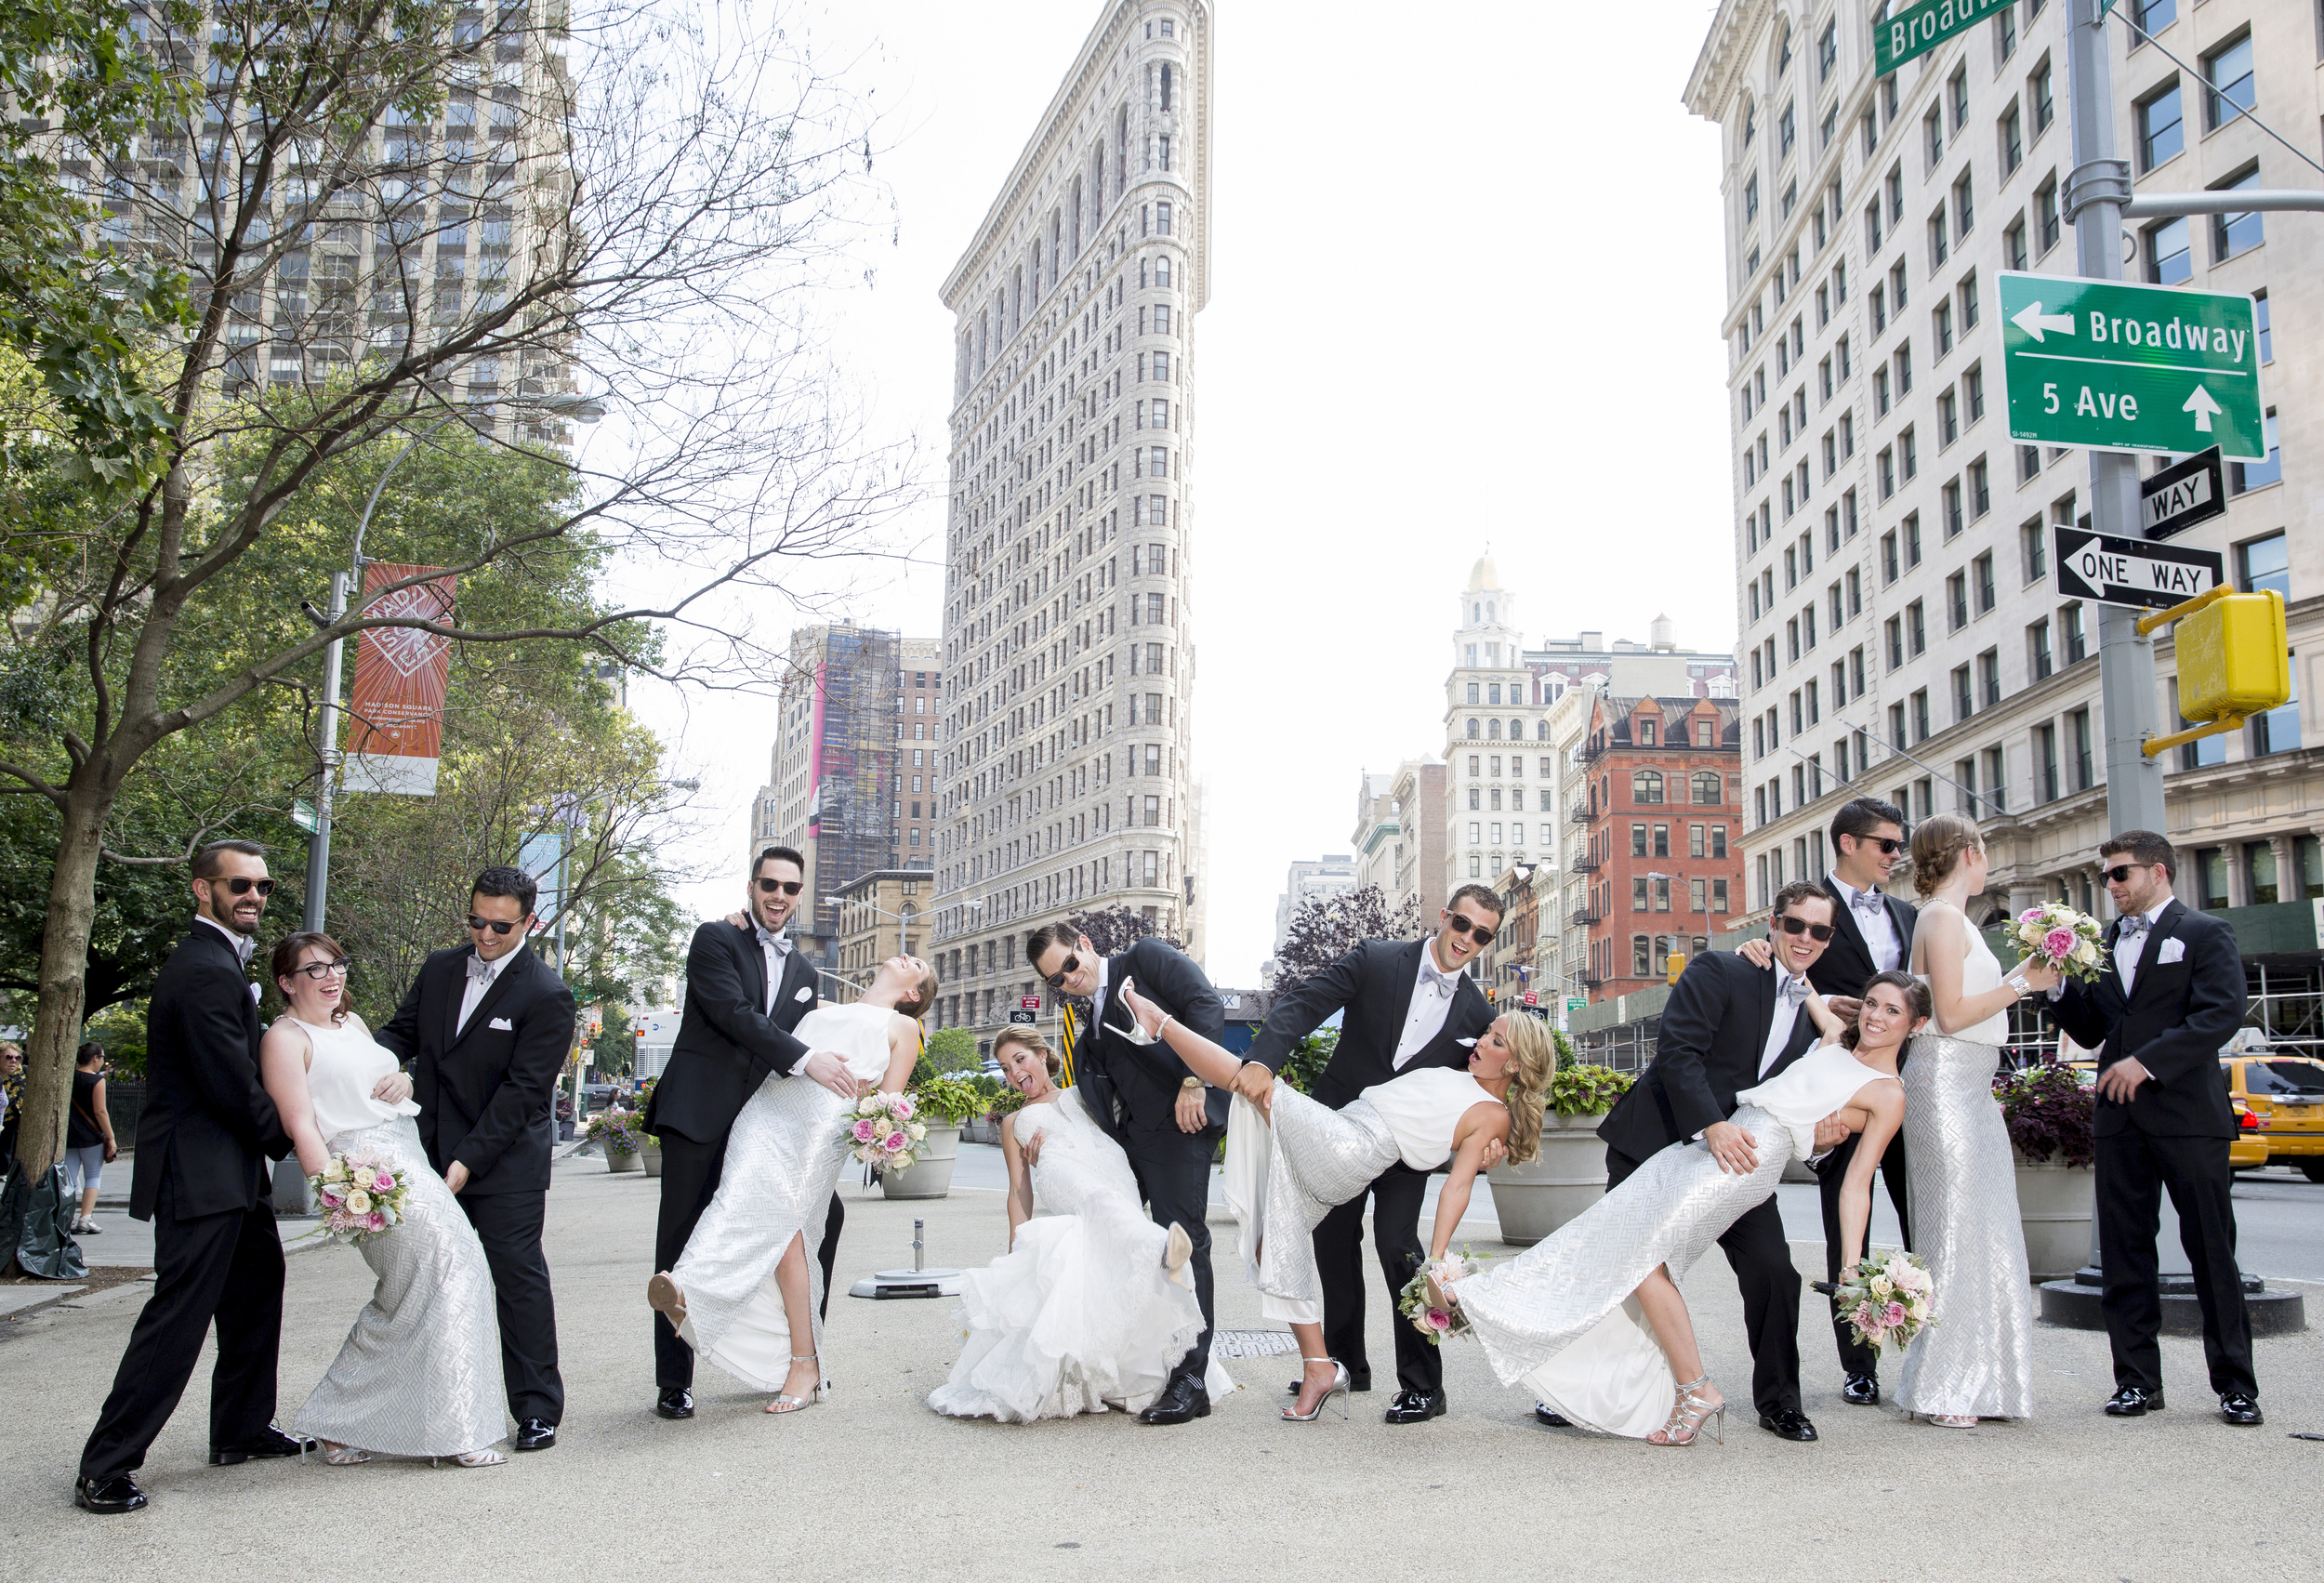 Ceci_New_York_Style_Luxury_Custom_Summer_Wedding_CeciBride_Letterpress_NewYork_Foil_Lighthouse_Chelsea_Piers_31.jpg